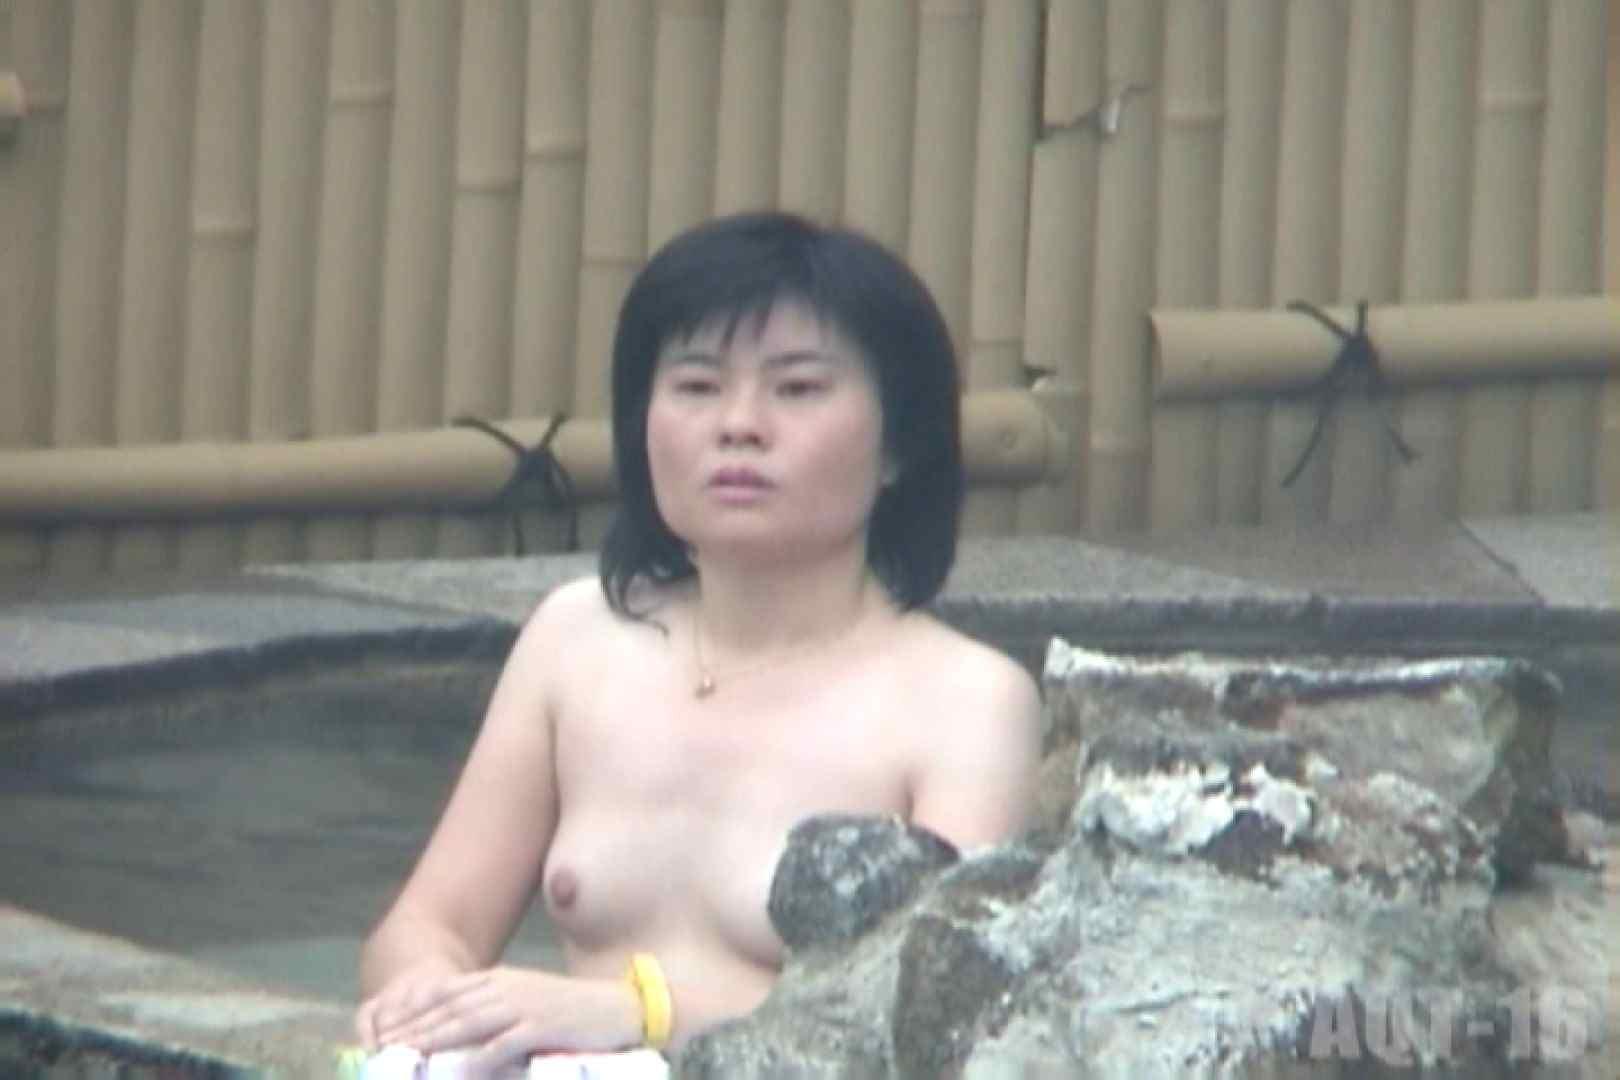 Aquaな露天風呂Vol.840 露天風呂編  97PIX 36